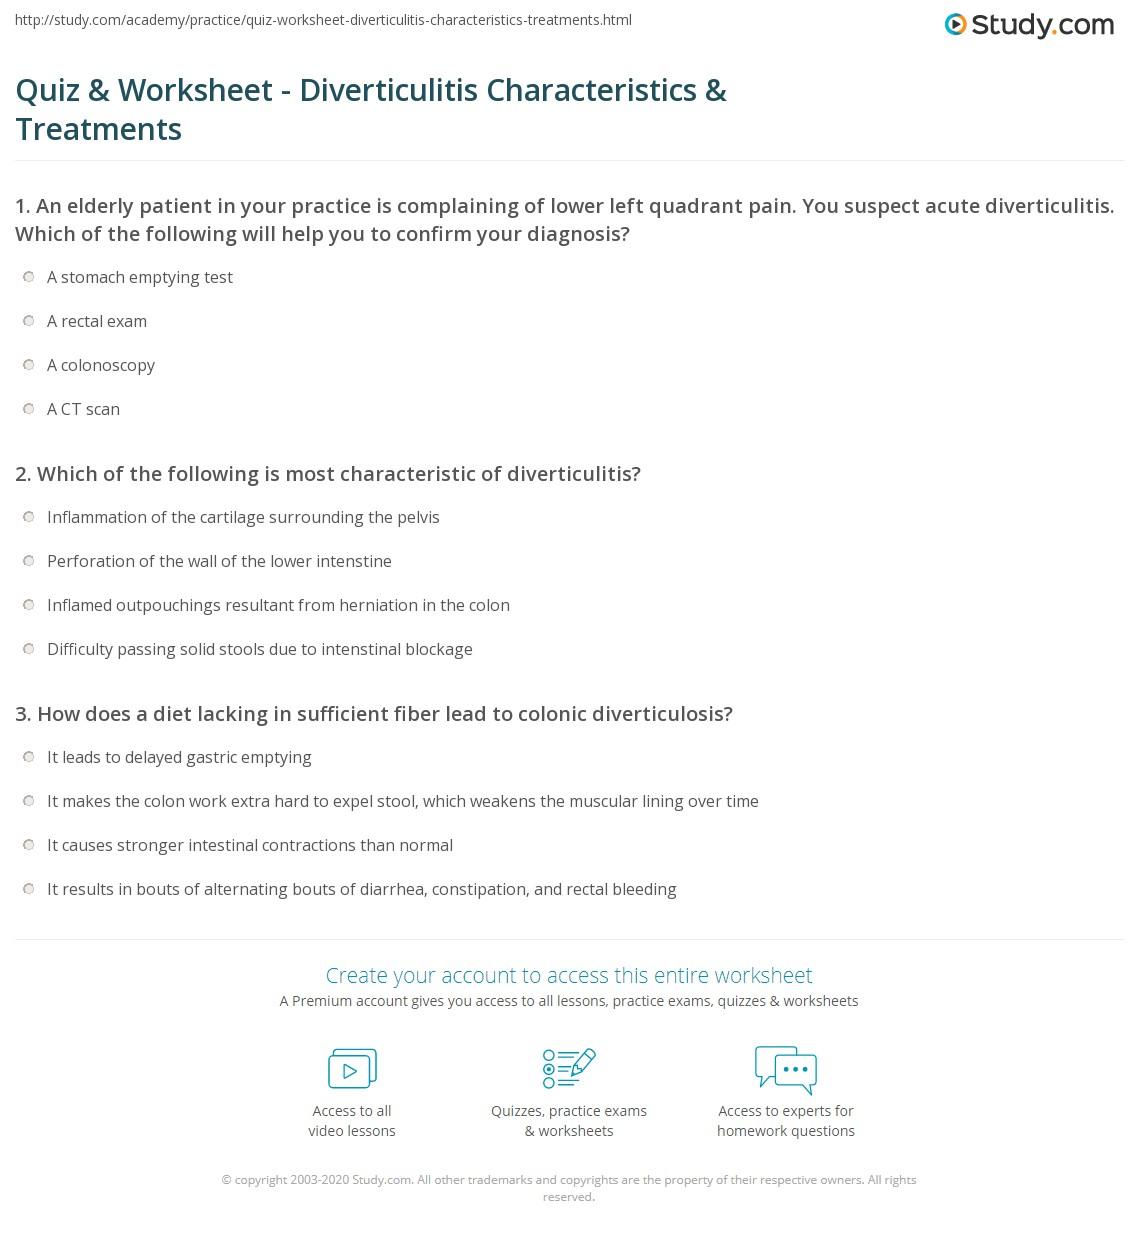 Diverticulitis Characteristics